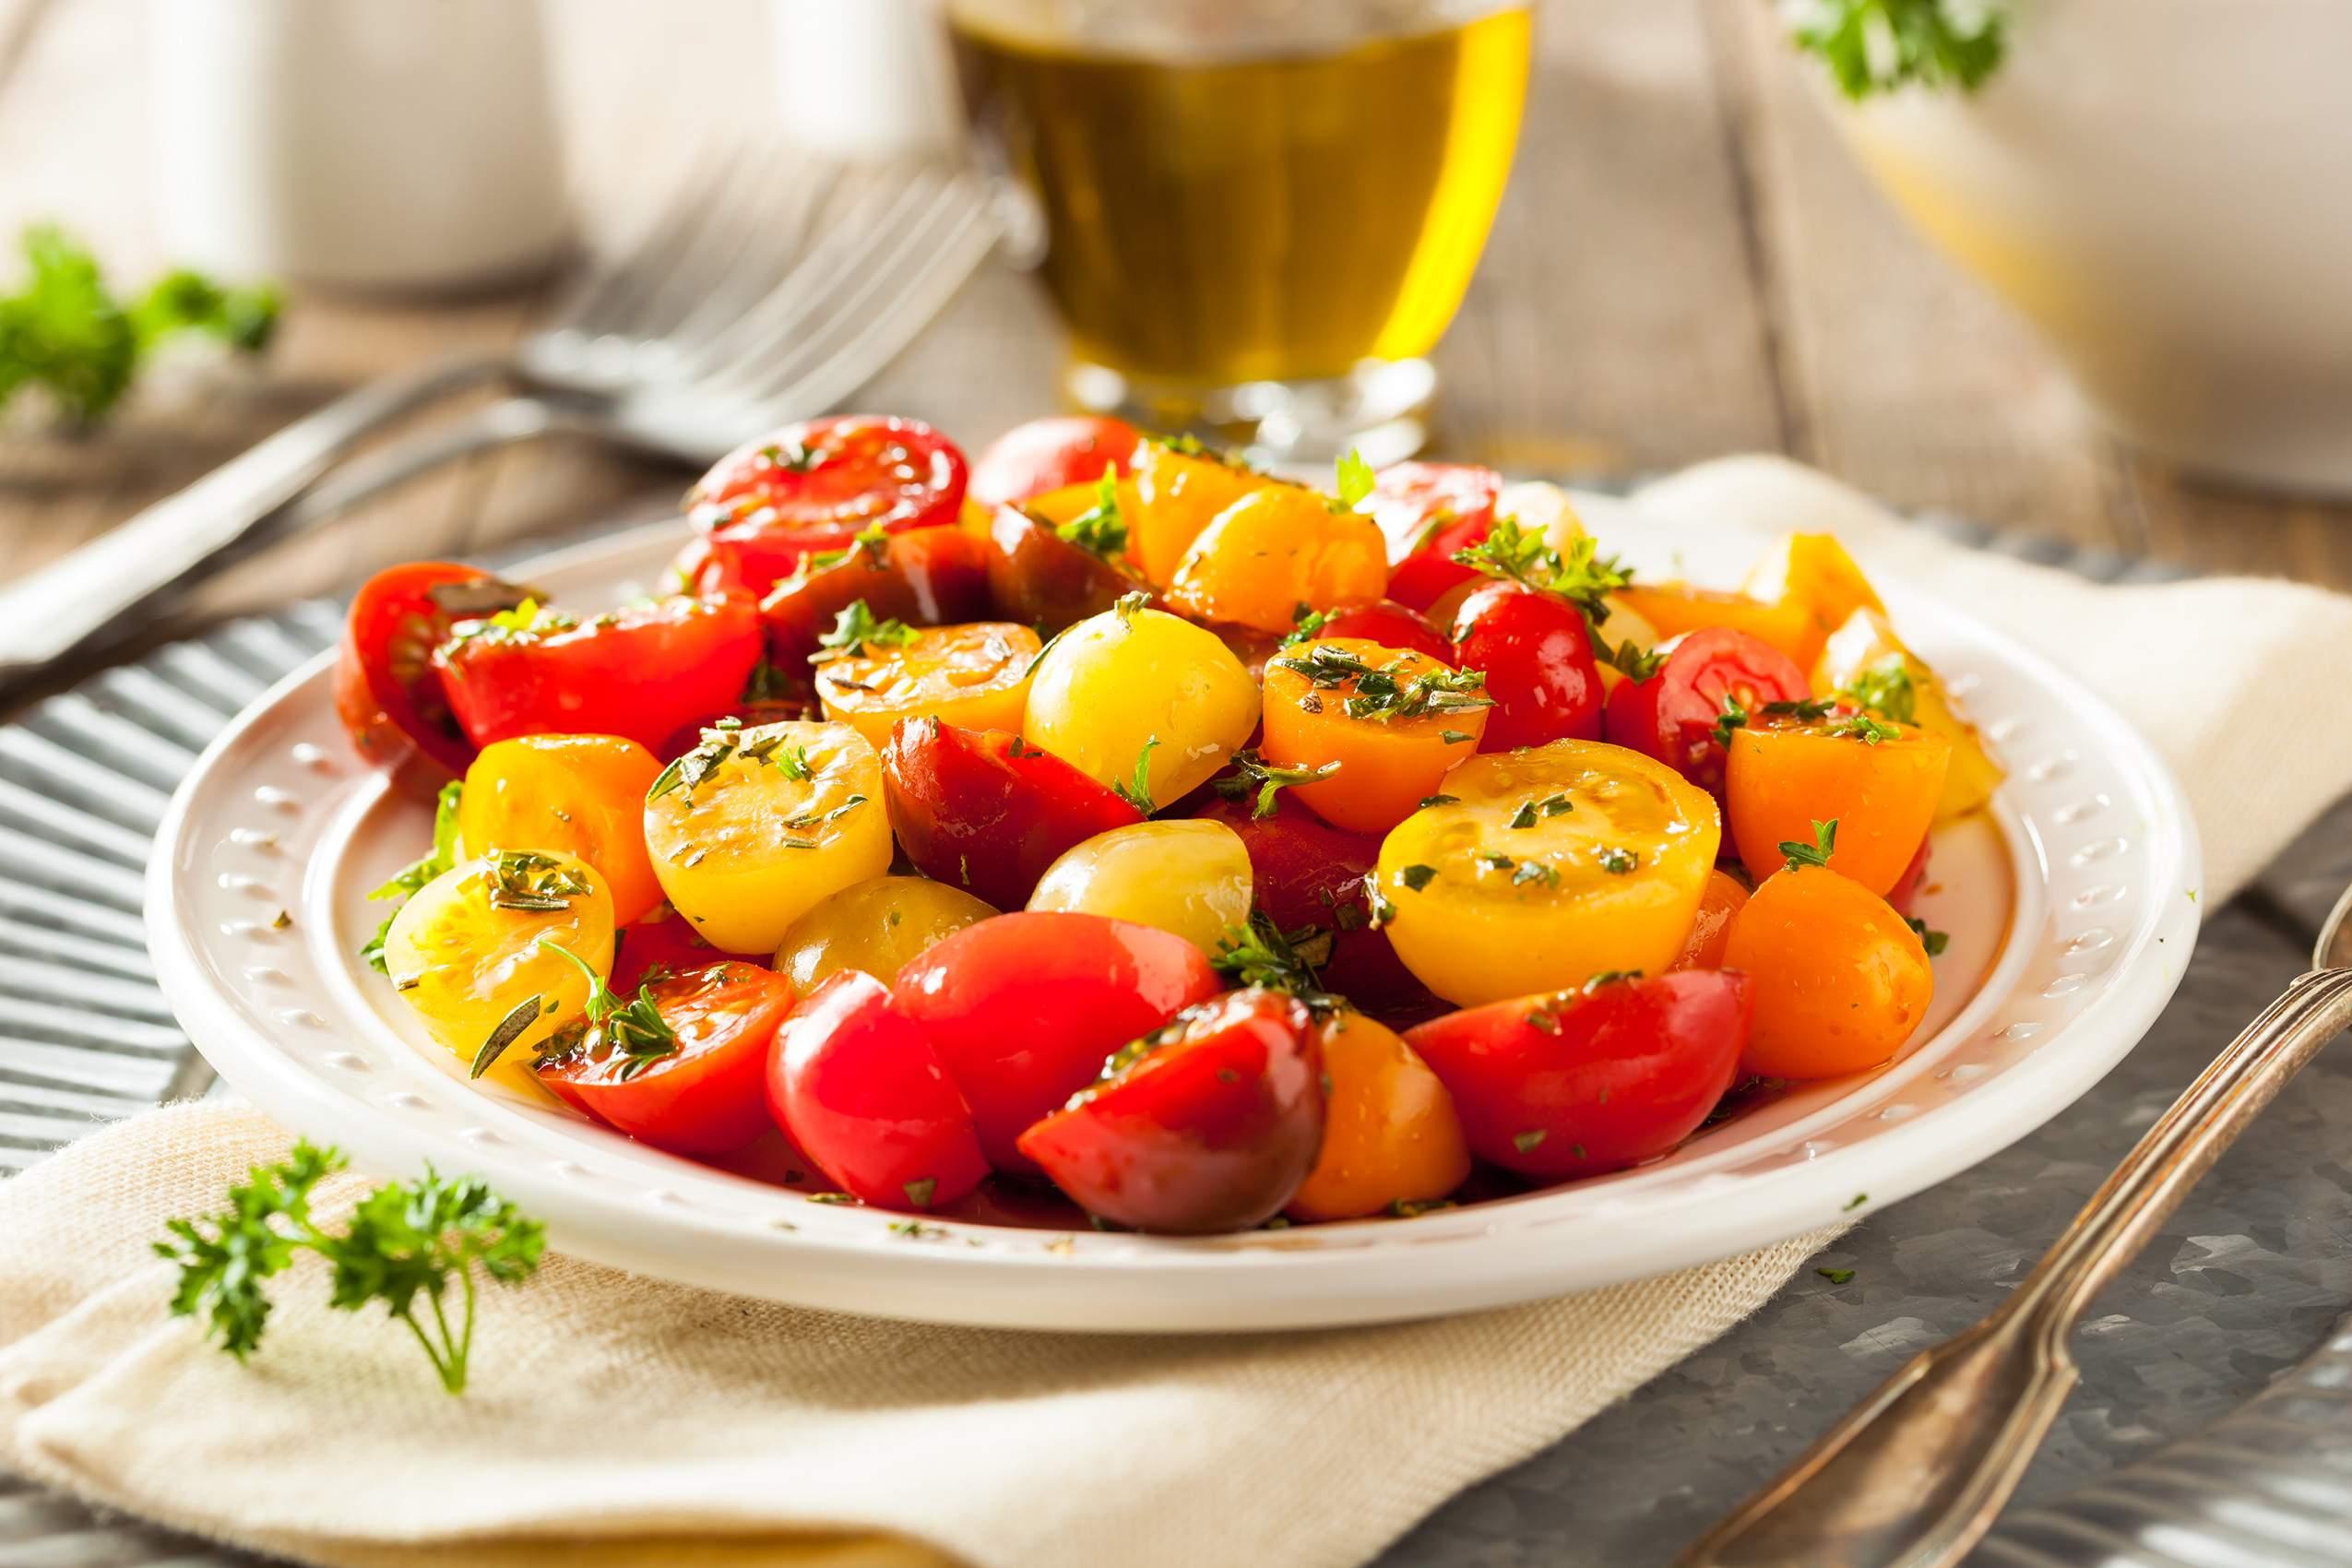 raw-organic-cherry-tomato-salad-PXNLV3L